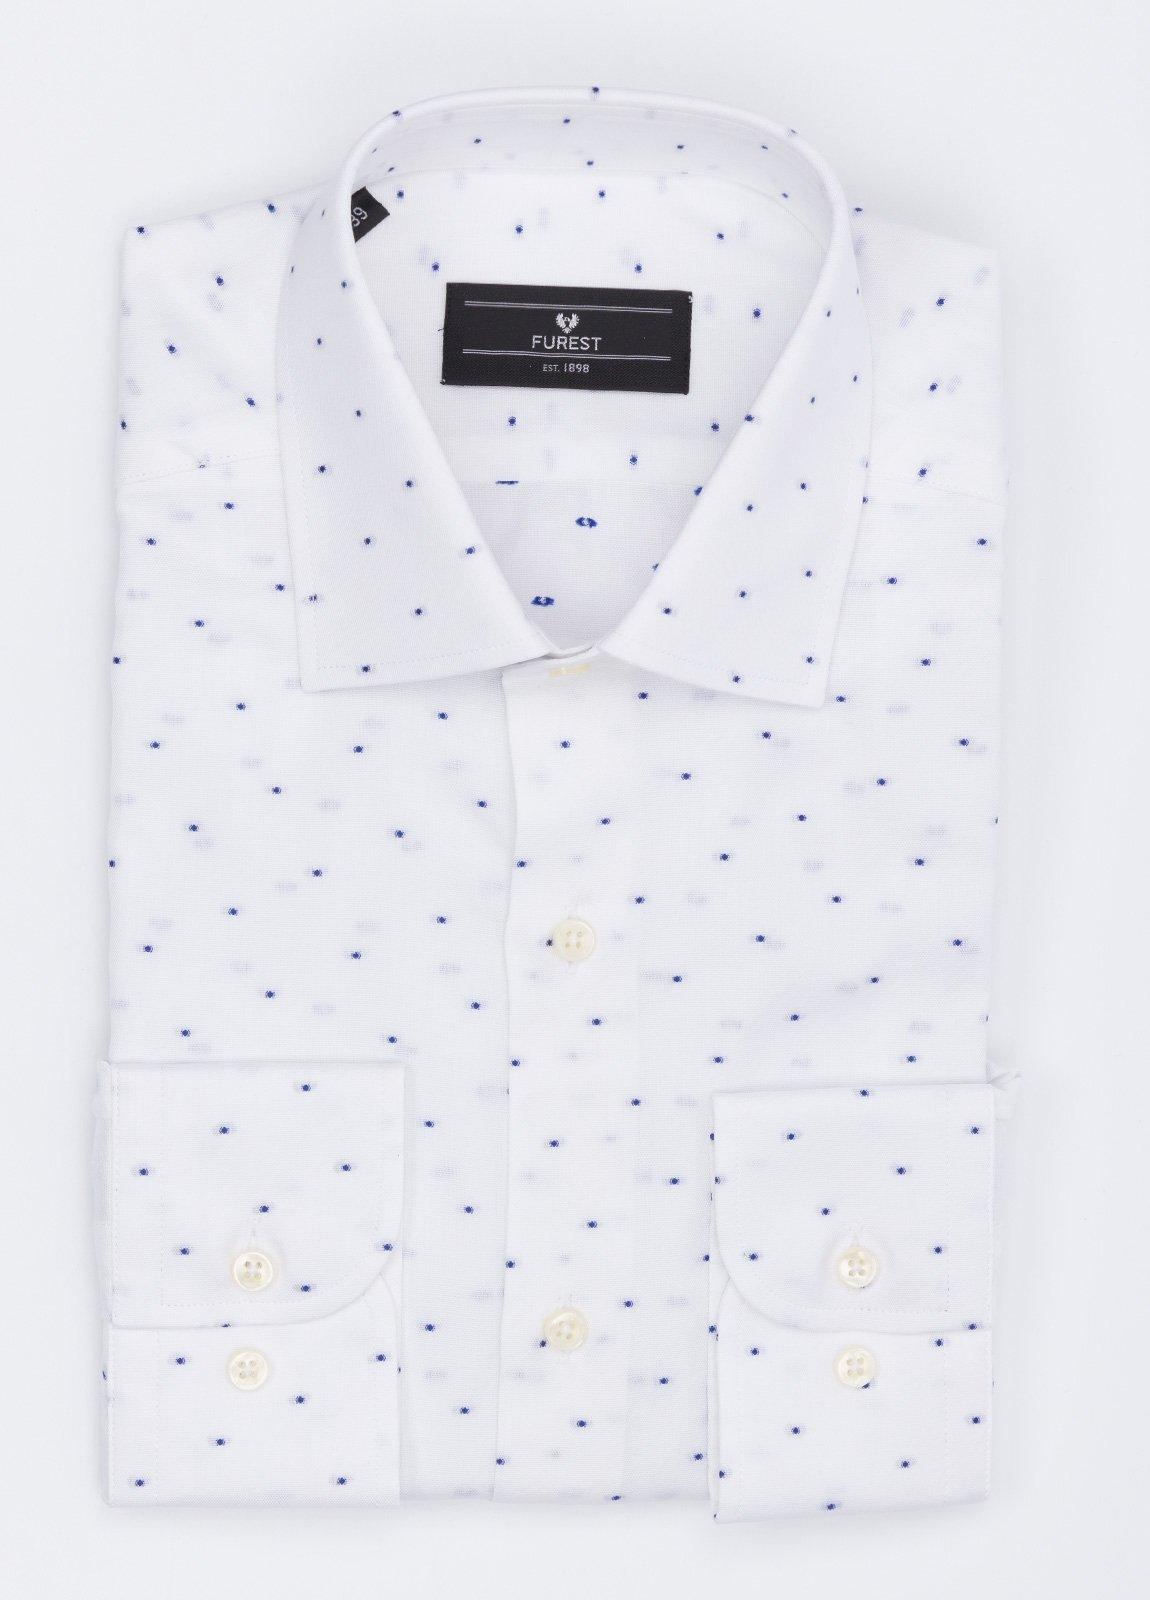 Camisa Formal Wear SLIM FIT cuello italiano modelo ROMA mini dibujo azul color blanco, 100% Algodón.